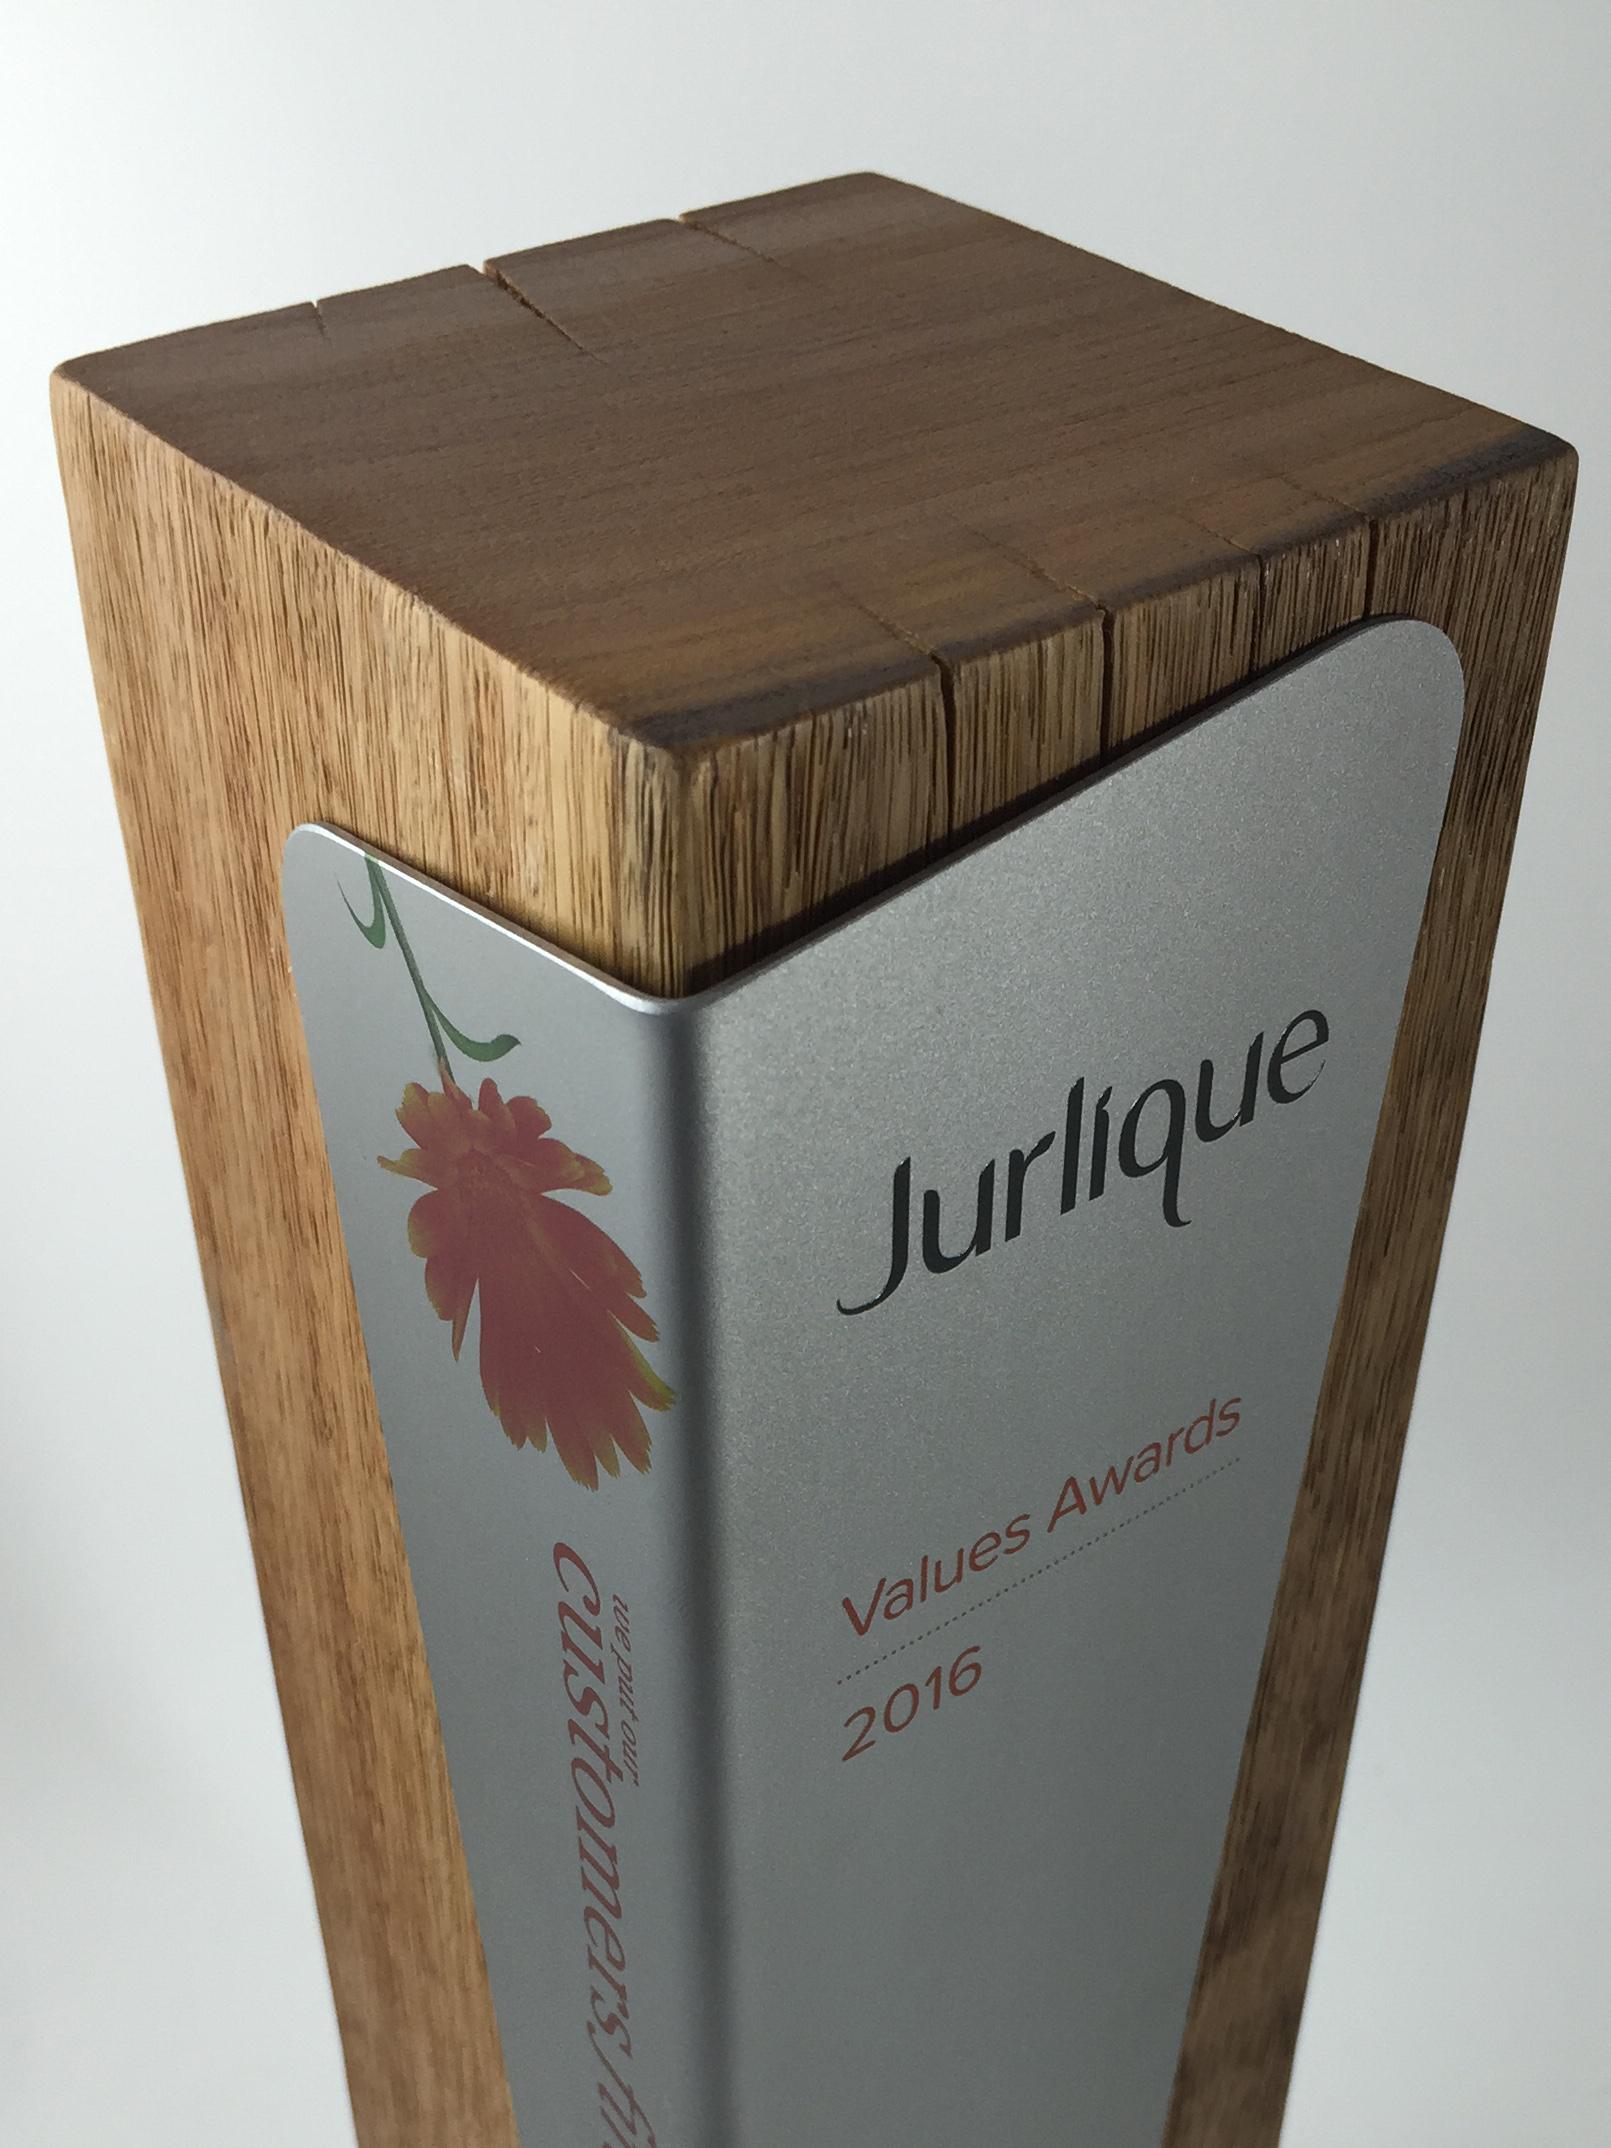 Jurlique_02Photo-17-11-16,-19-09-18.jpg